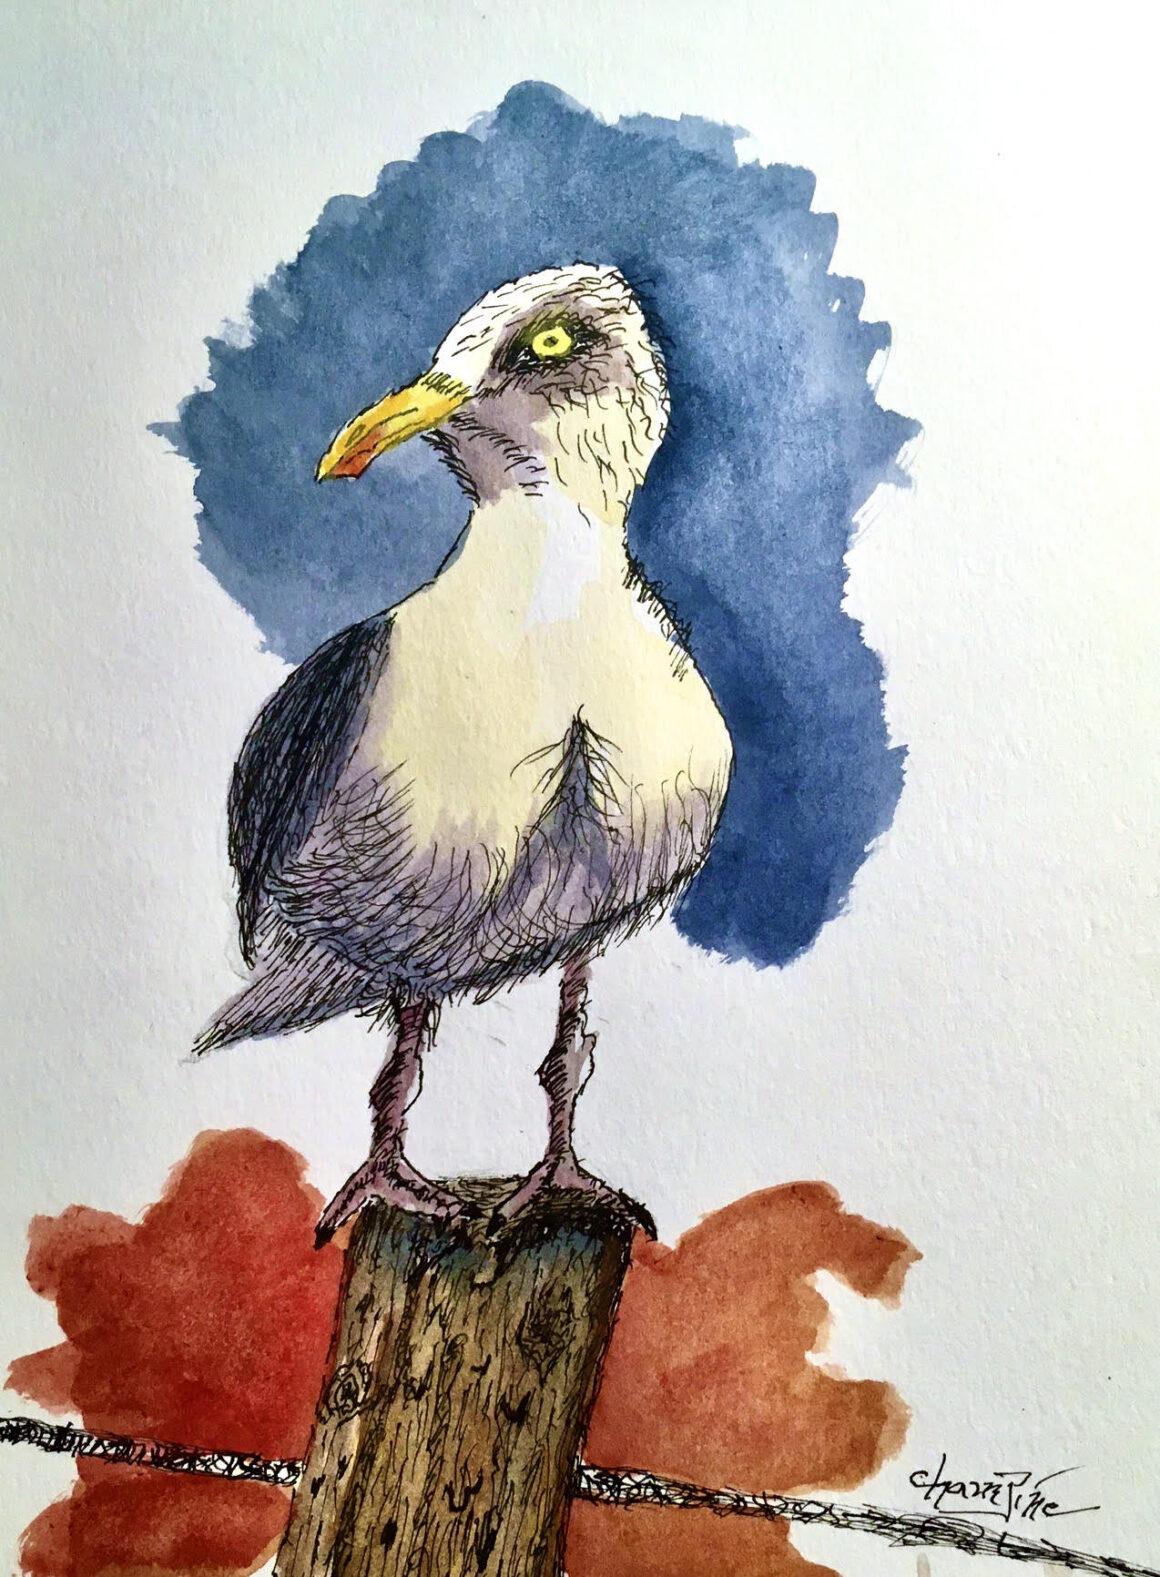 #1 – Sea Gull – Frank Champine – Age 77